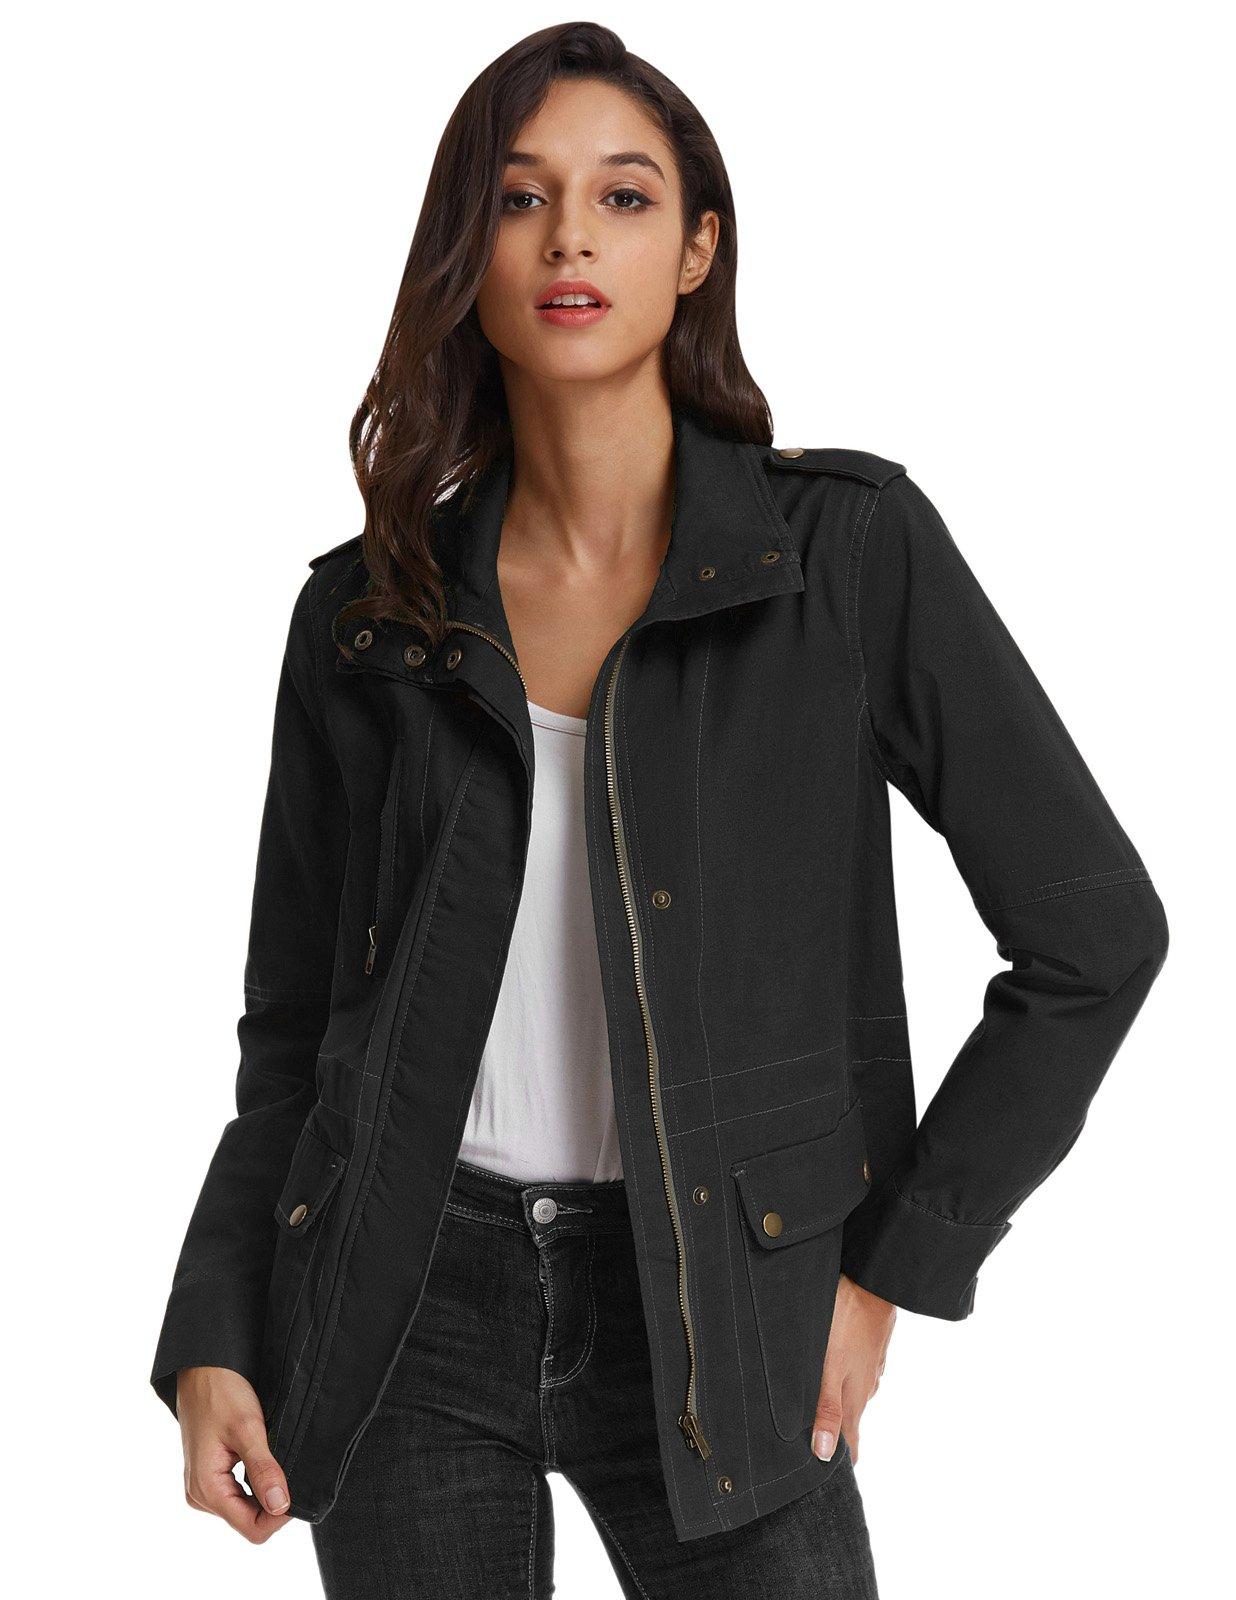 Kate Kasin Ladies Cotton Coat Jacket Safari Utility Parka Coat L KK811-3